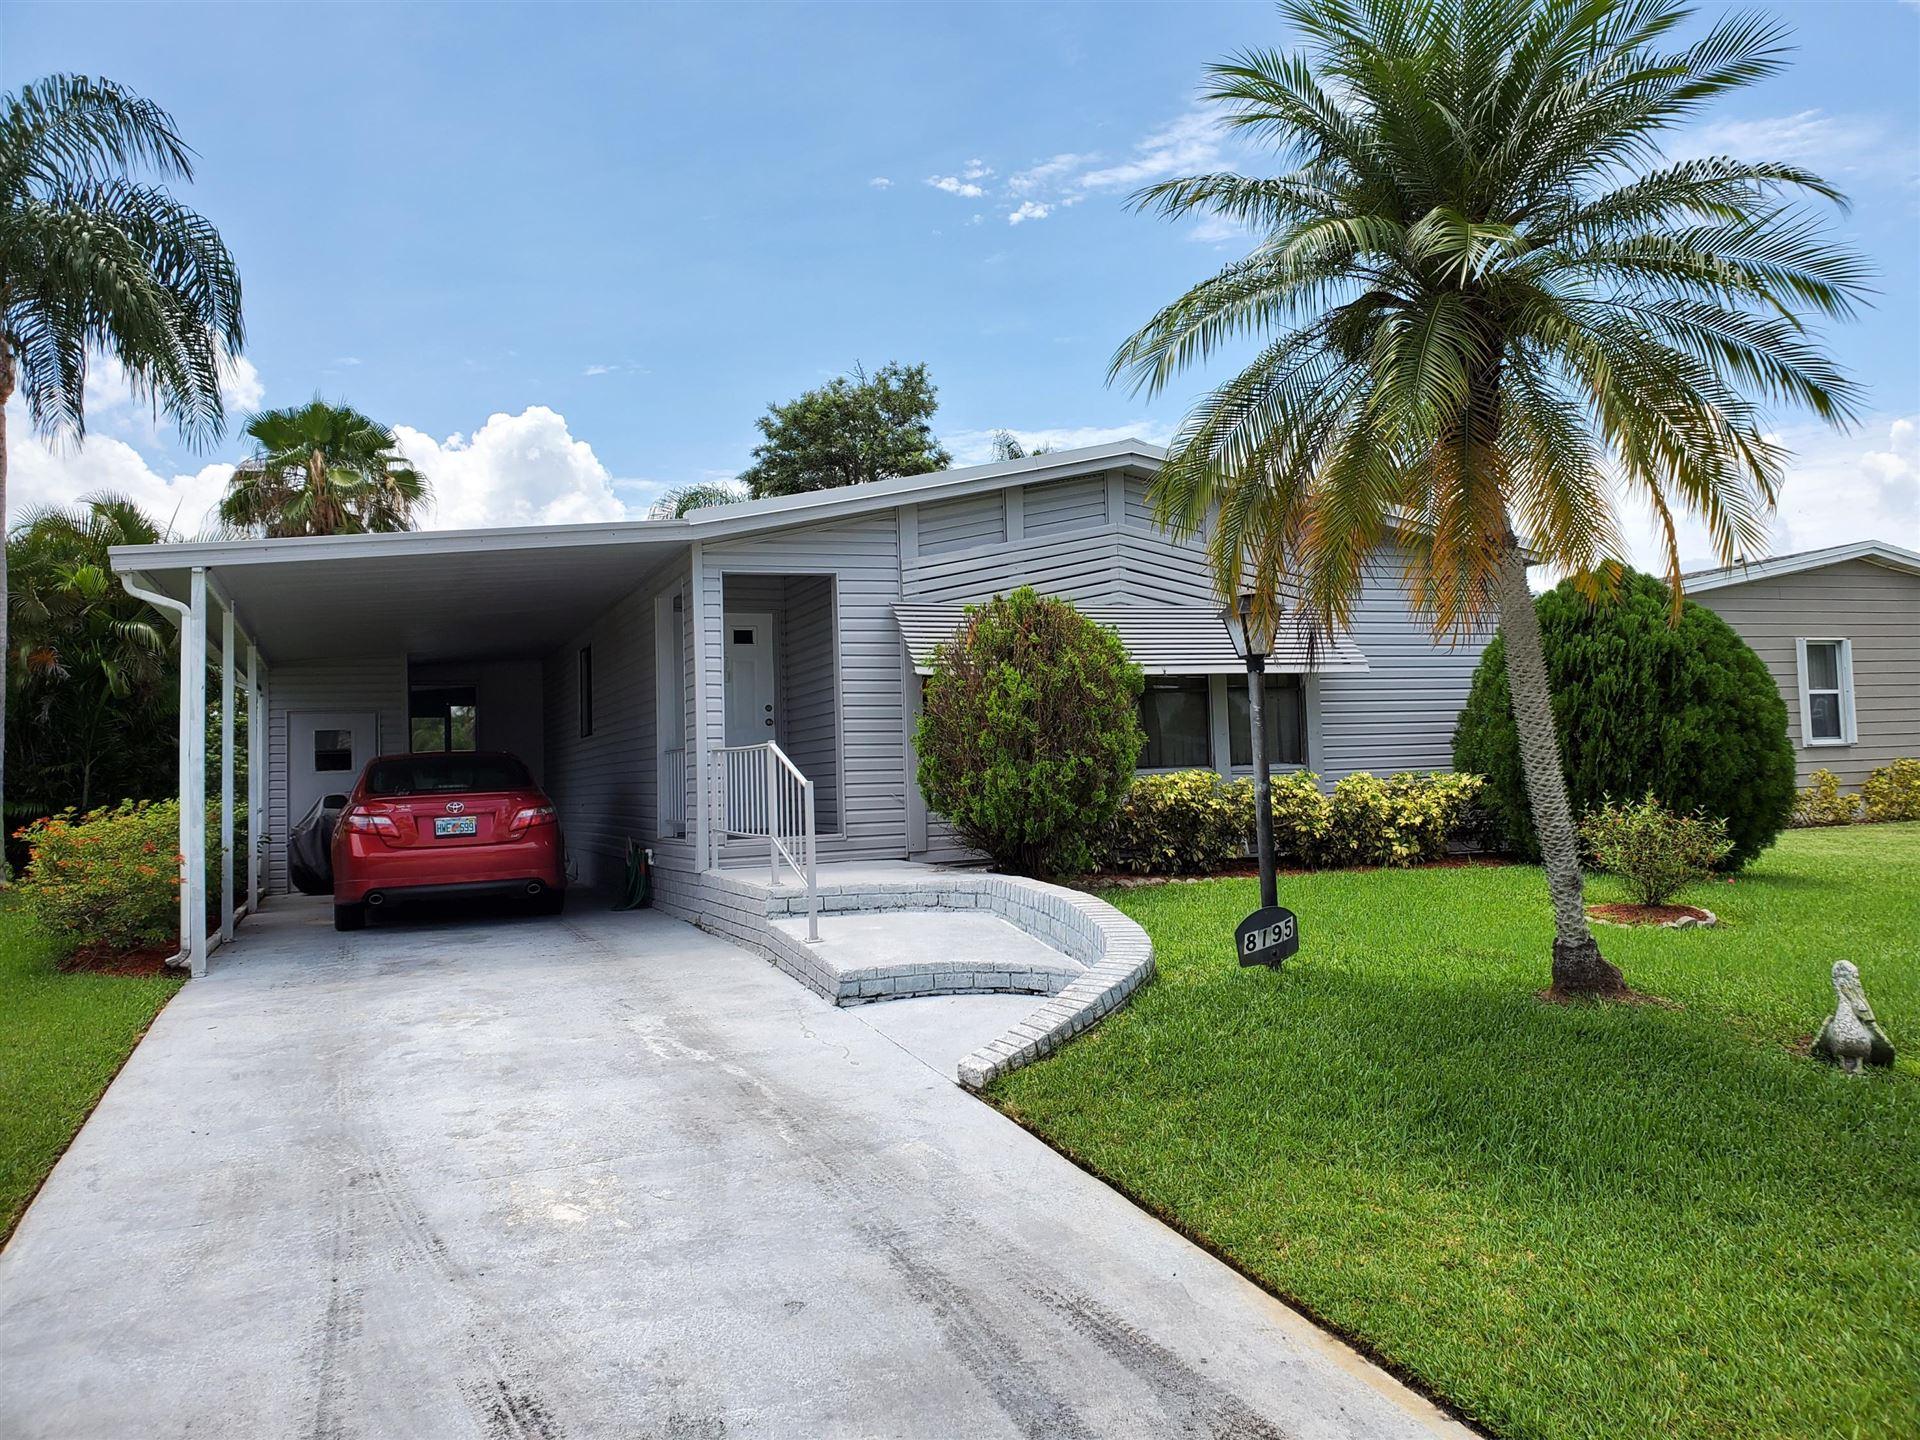 8195 Buckthorn Circle, Fort Pierce, FL 34952 - #: RX-10629479